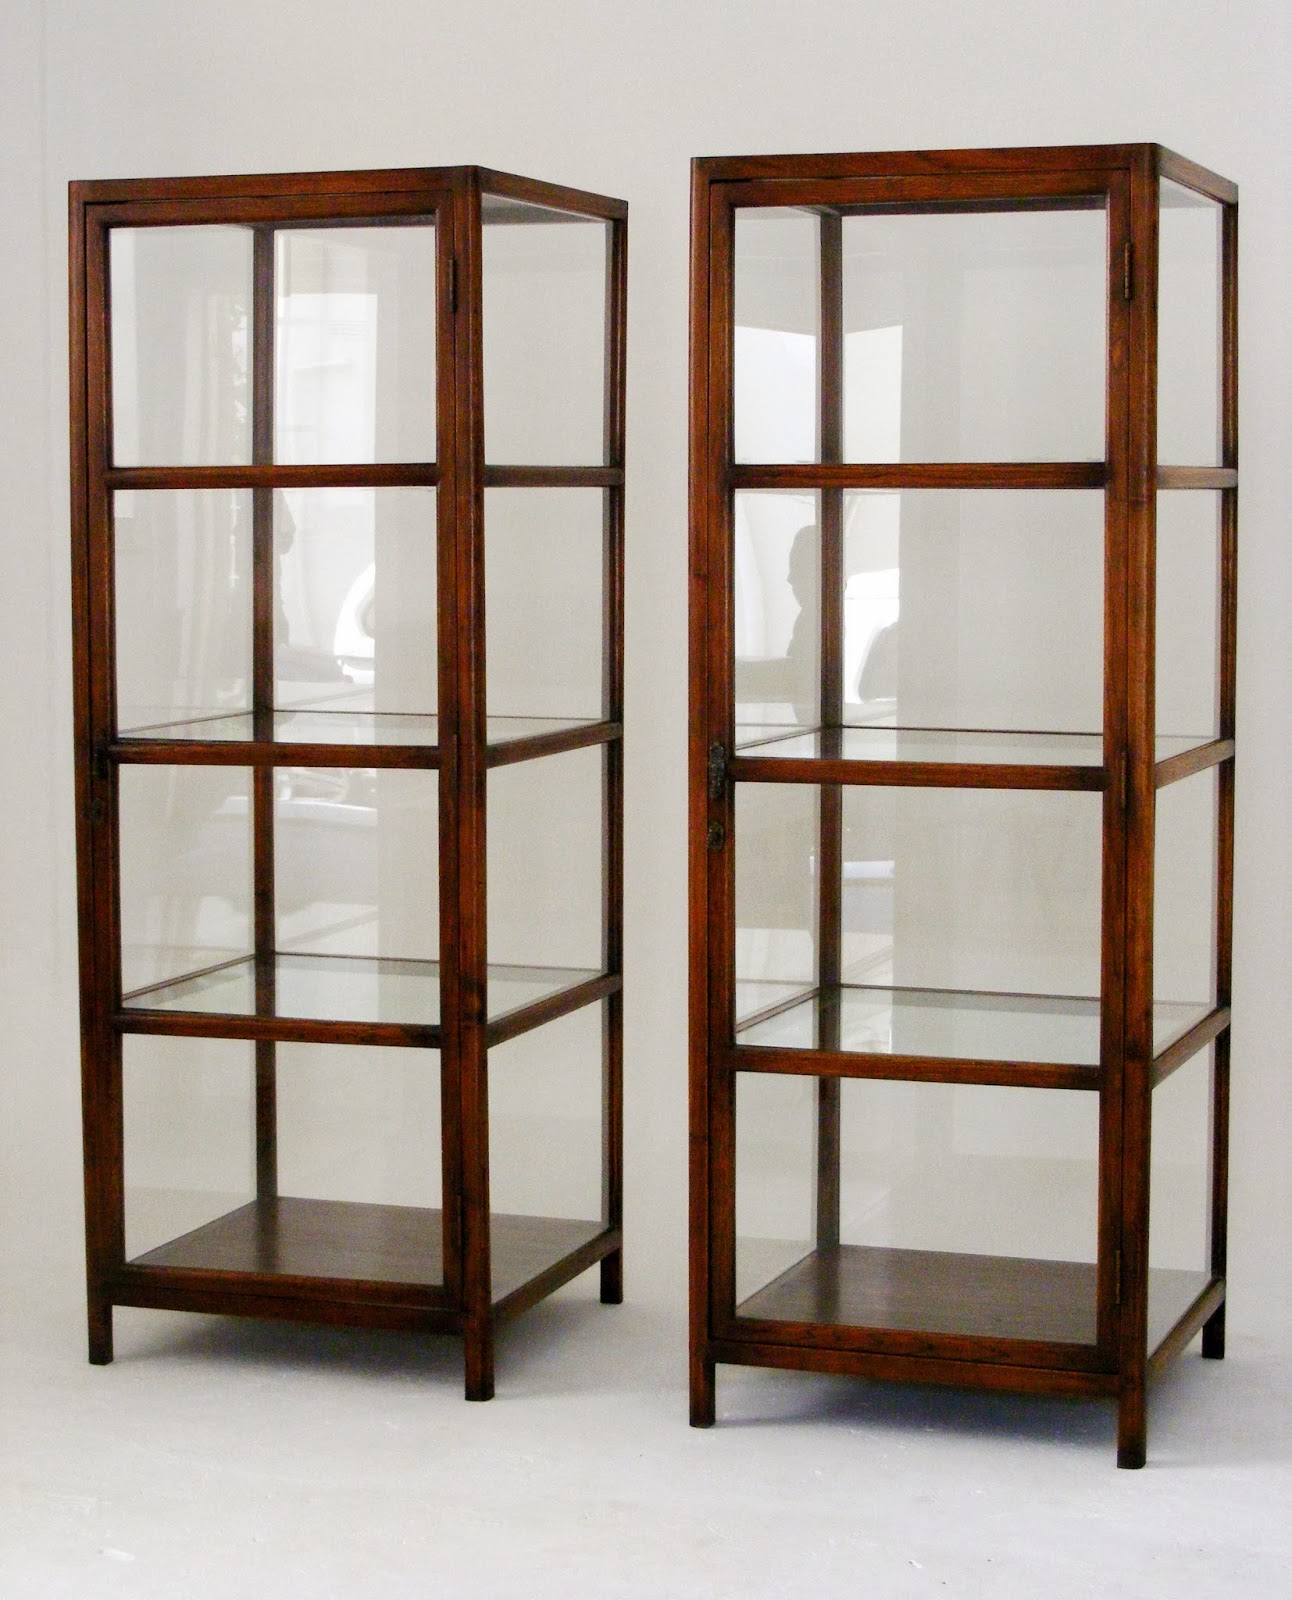 VAMP FURNITURE: New Vintage Furniture At Vamp